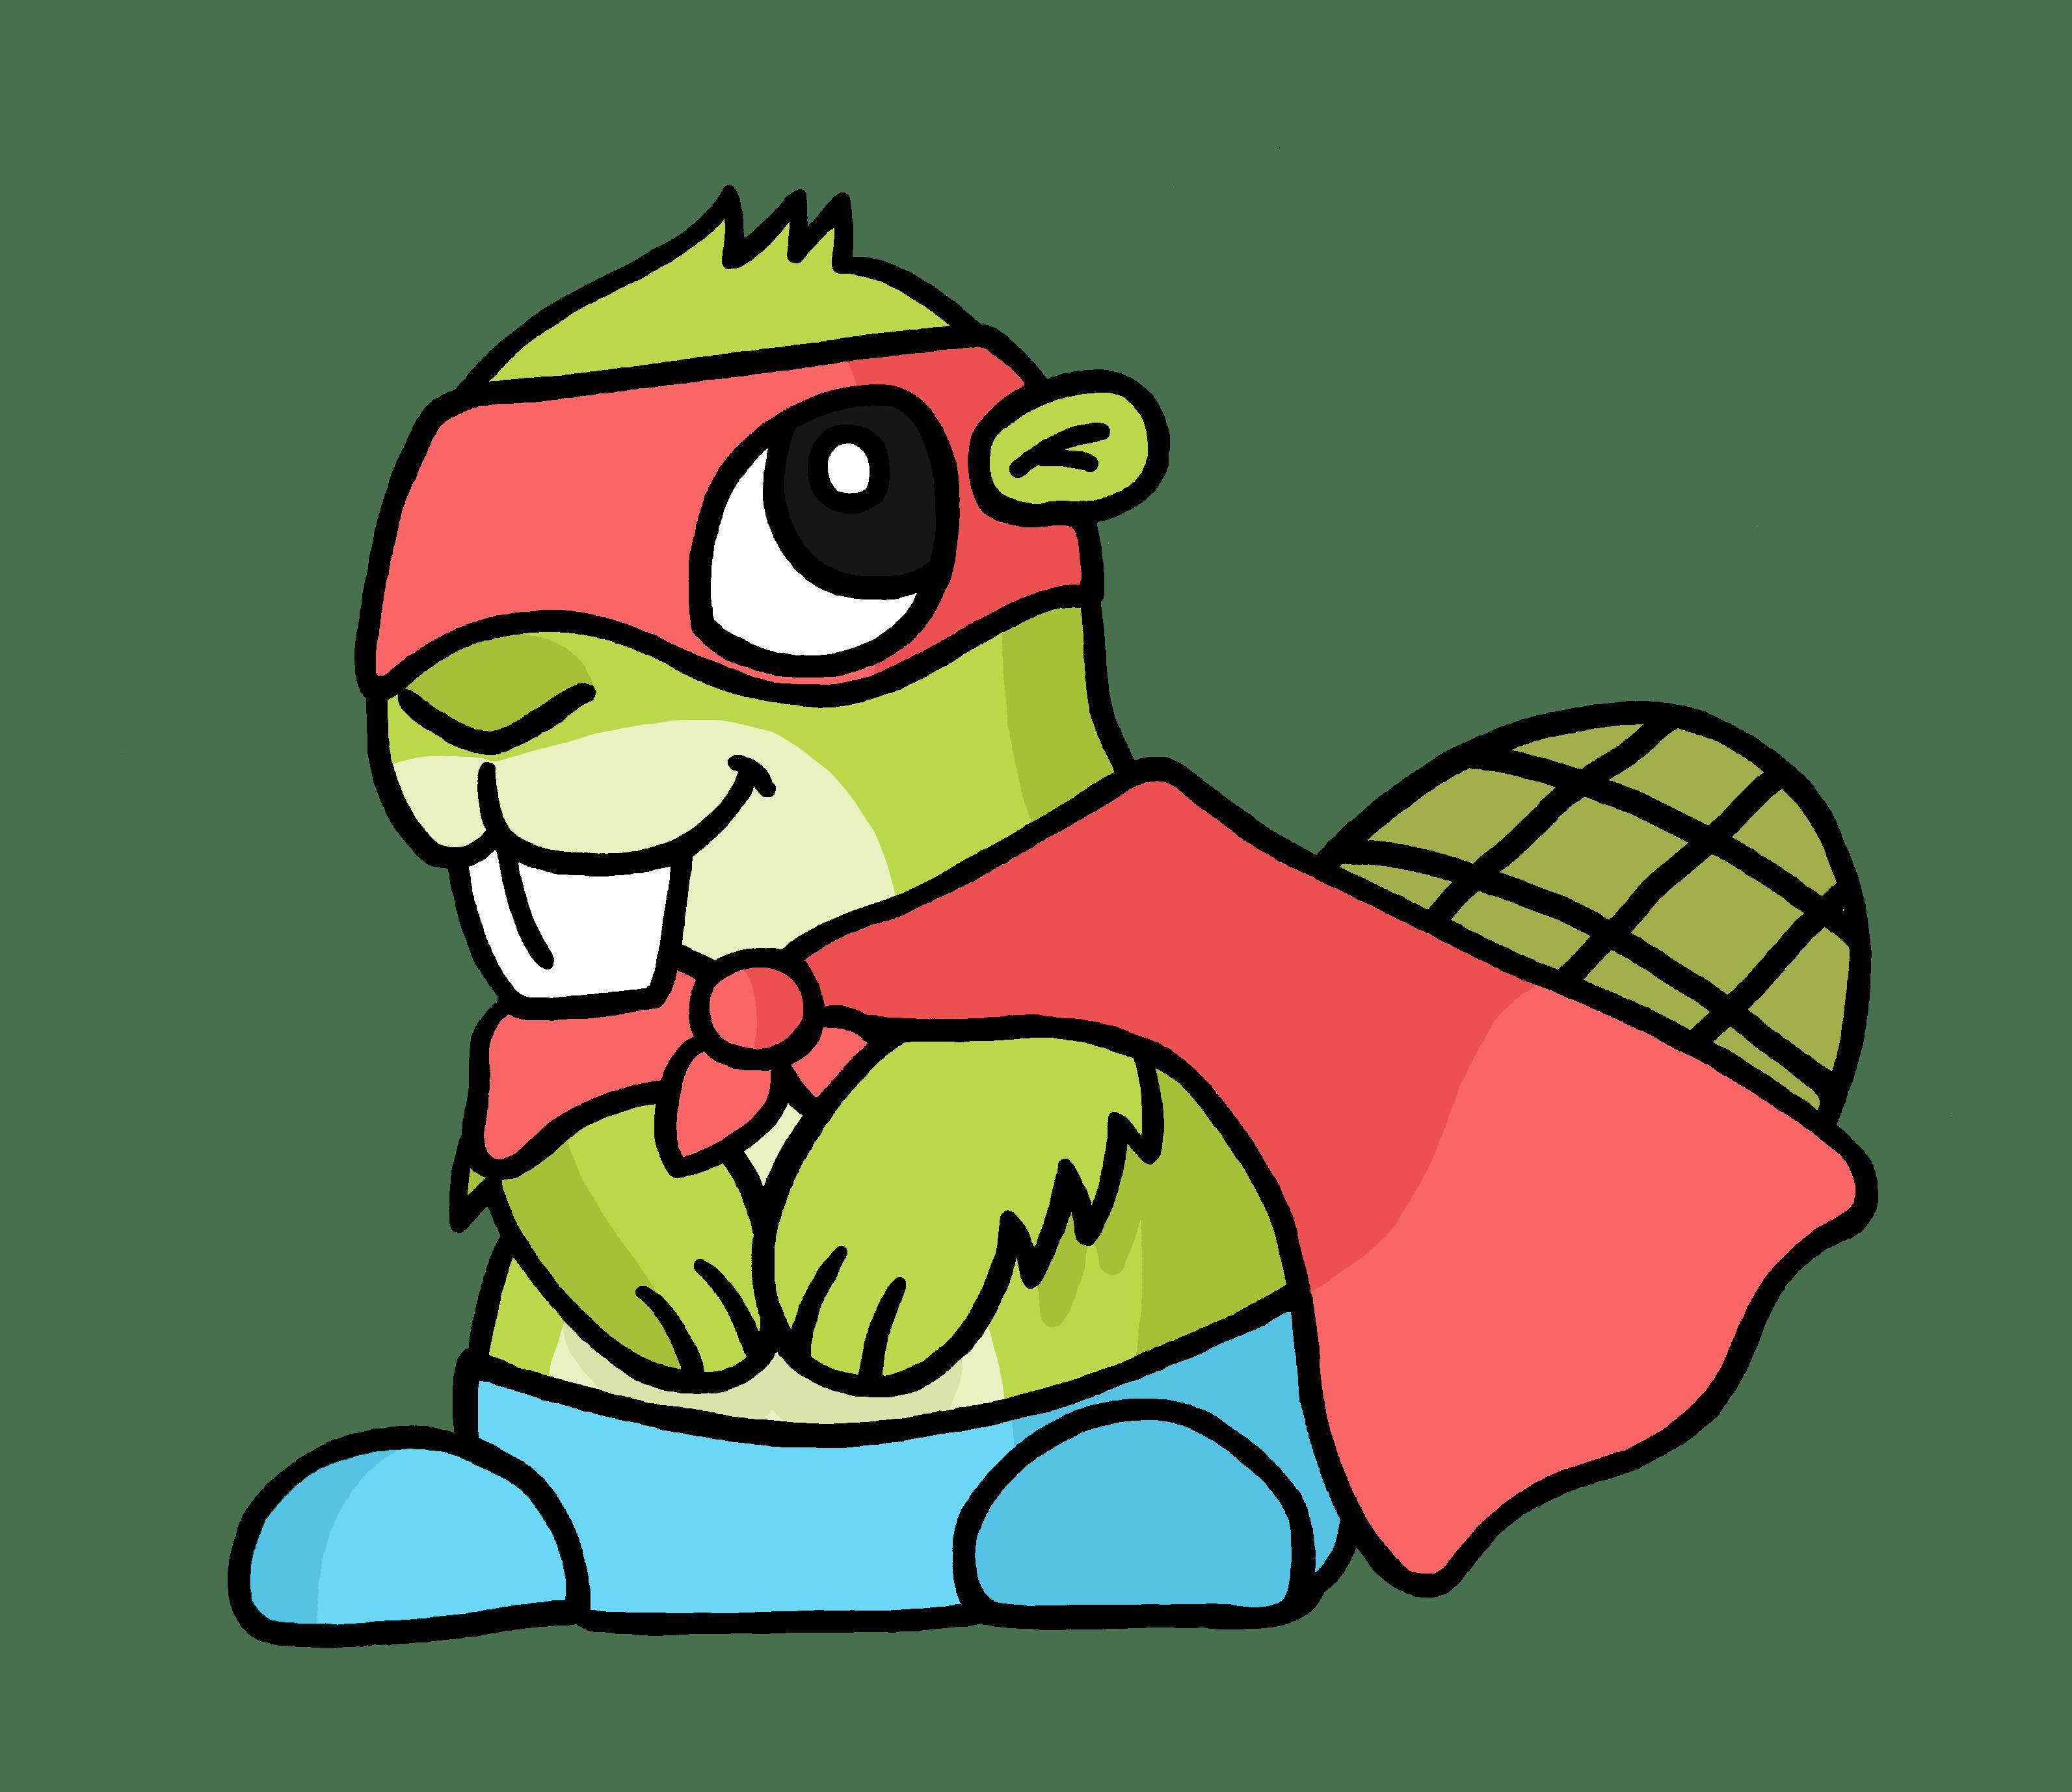 Hero clipart animal. Superhero adsy transparent png